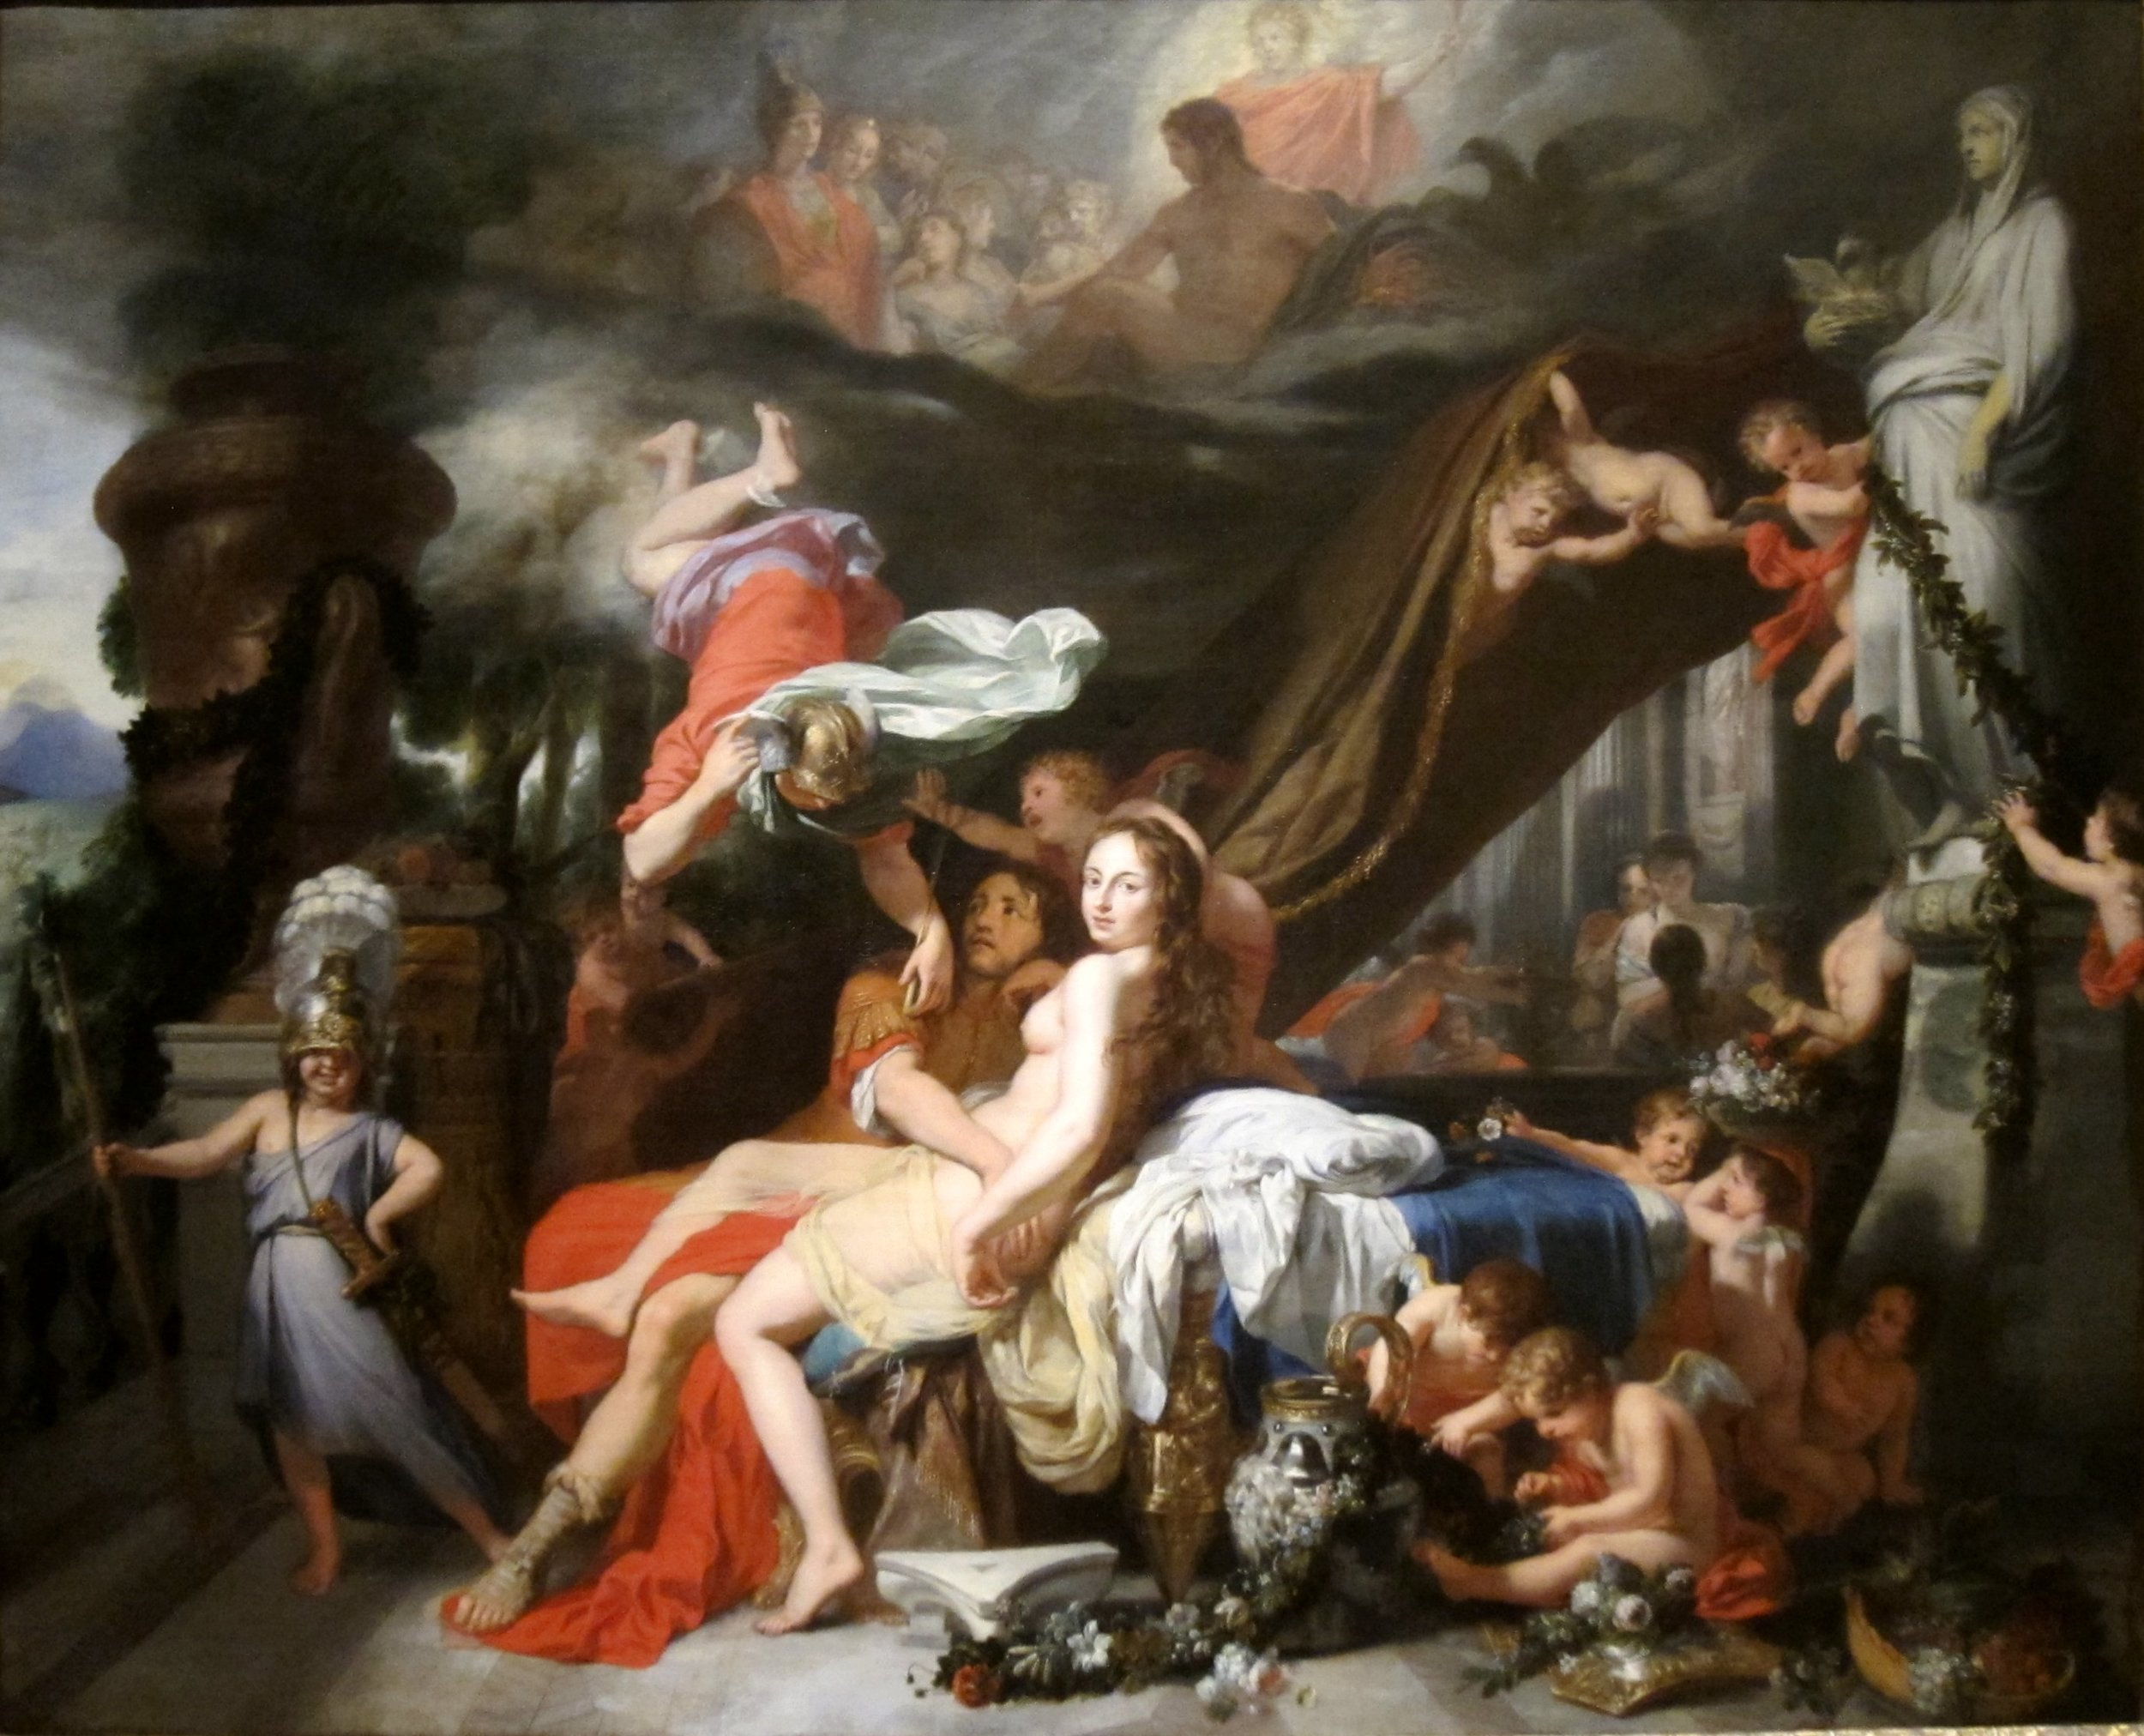 'Hermes_Ordering_Calypso_to_Release_Odysseus'_by_Gerard_de_Lairesse,_c._1670.JPG